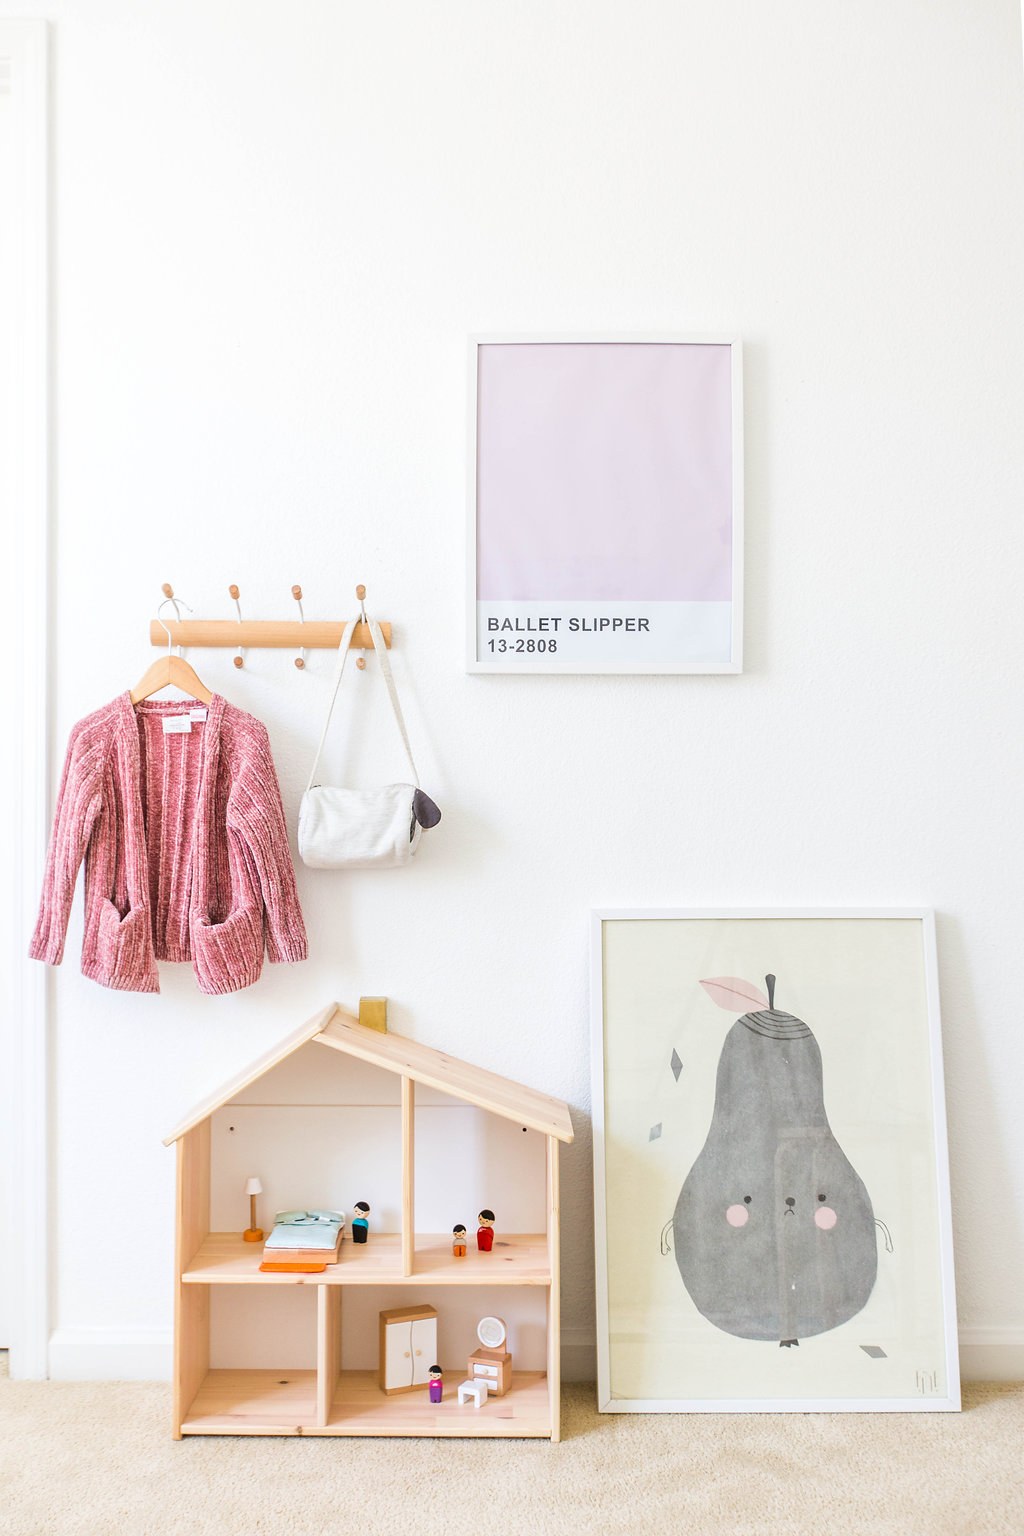 wall hooks  |  dollhouse  |  pear print  |  ballet slipper print